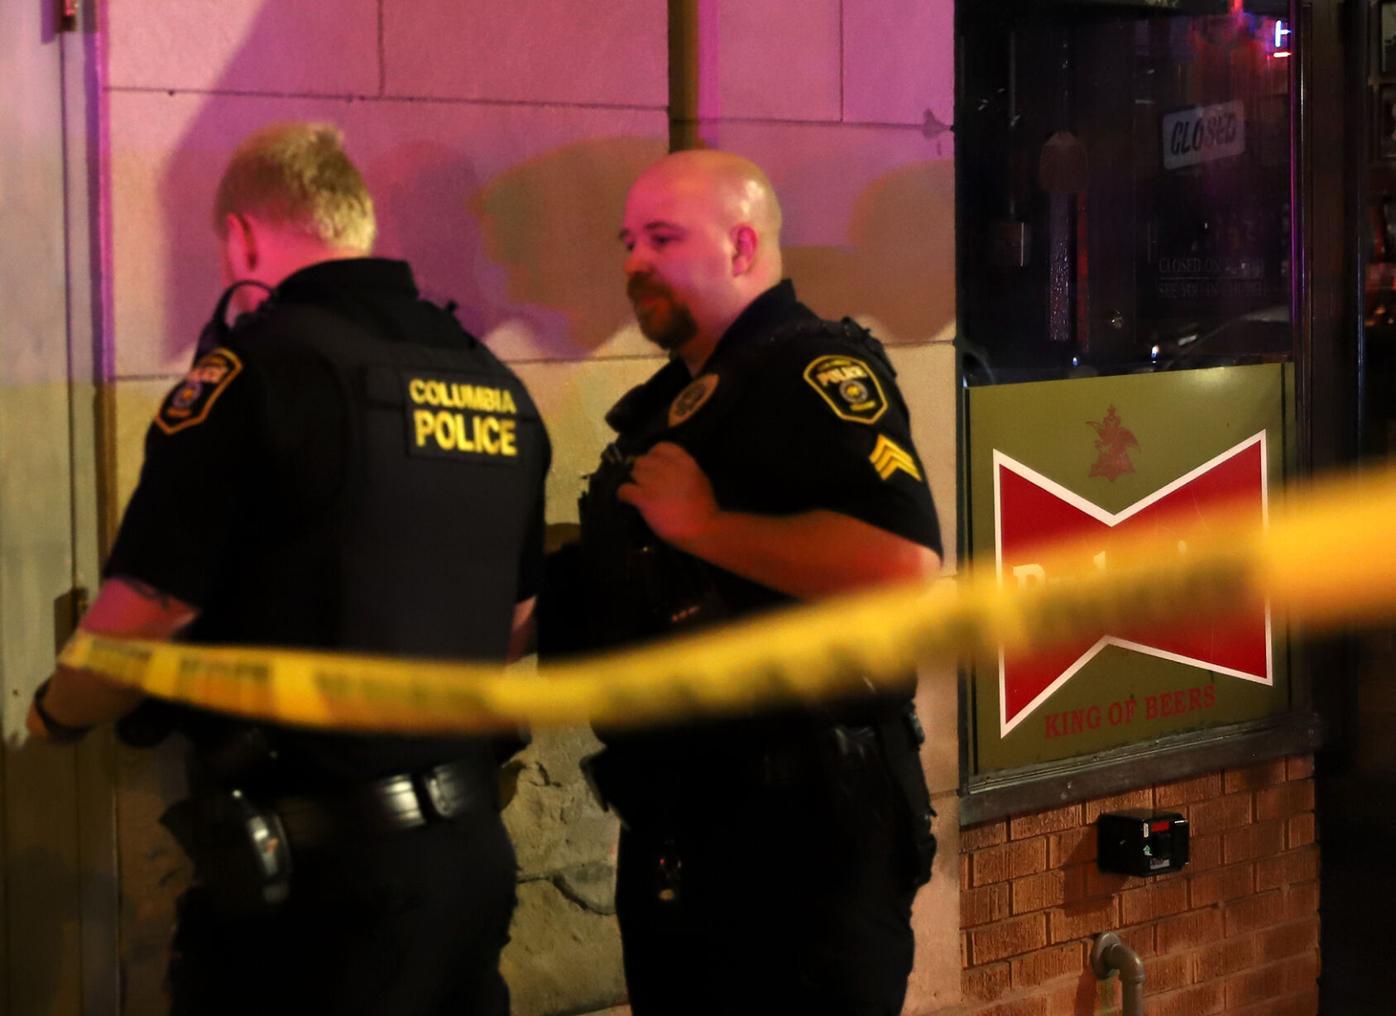 Columbia Police tape off Ninth street